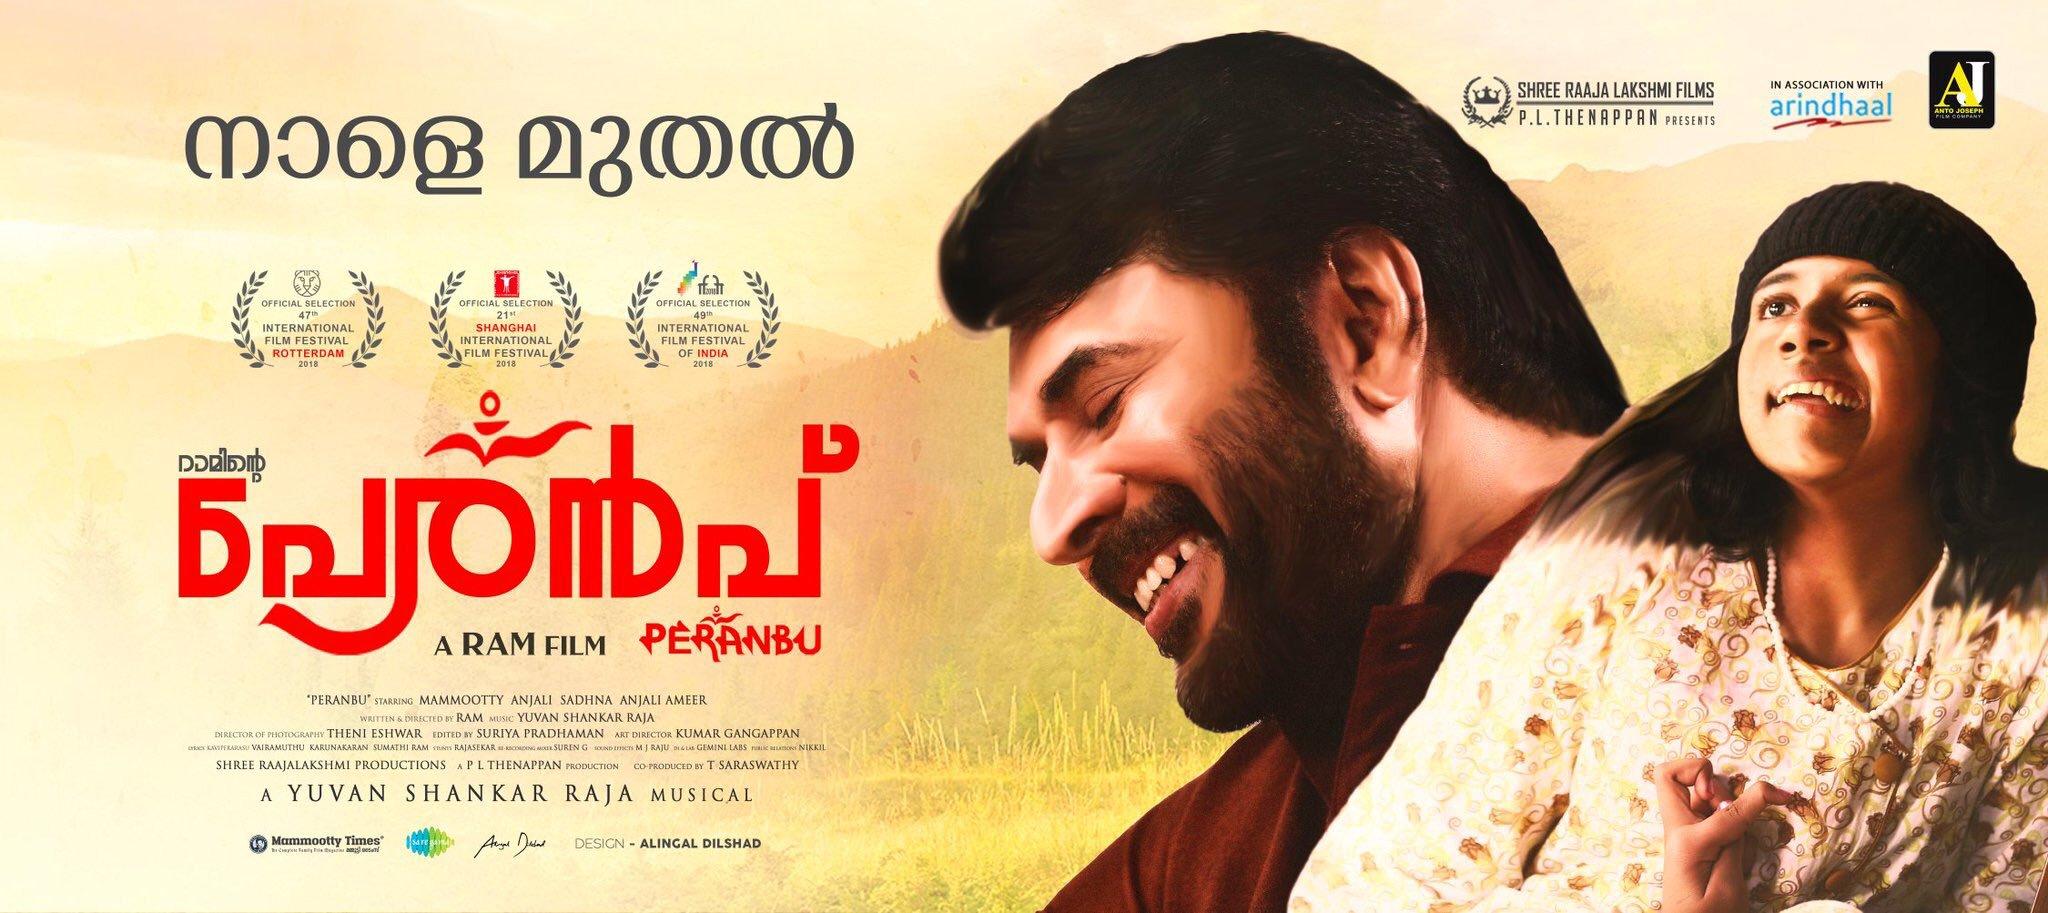 Survi-Review-Tamil-Peranbu-Compassion-Rating-Explaination